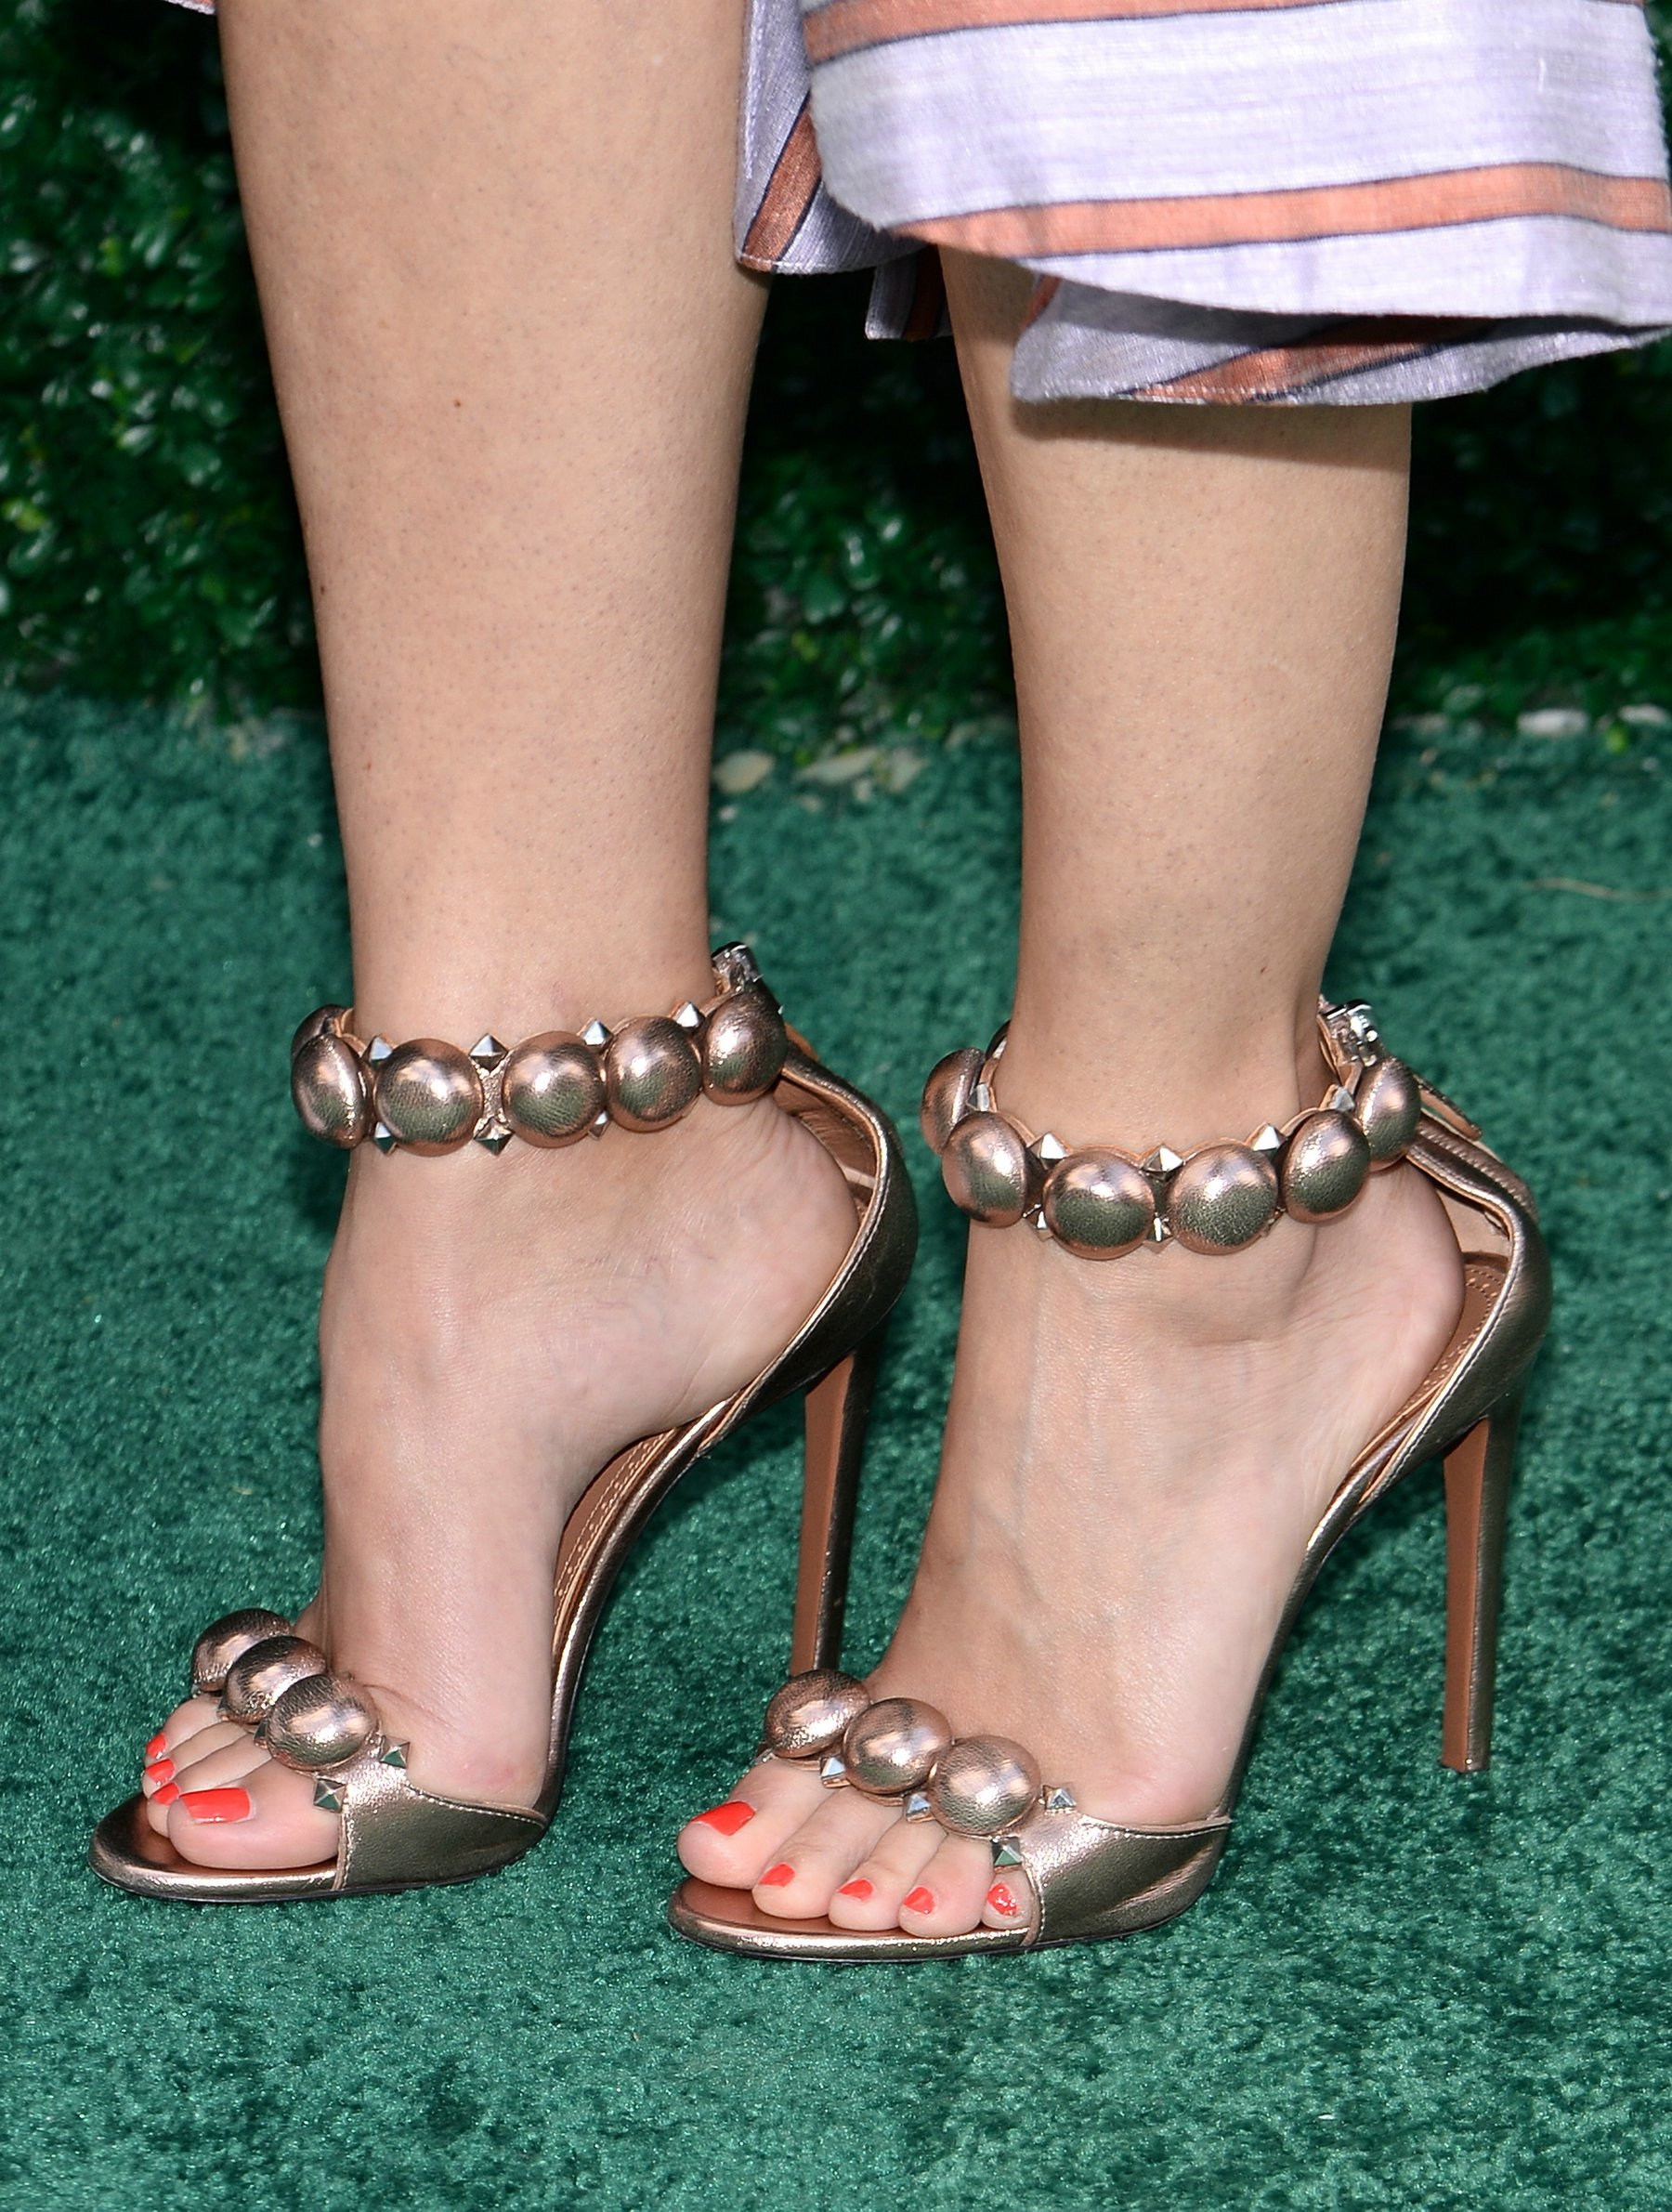 keri russell feet